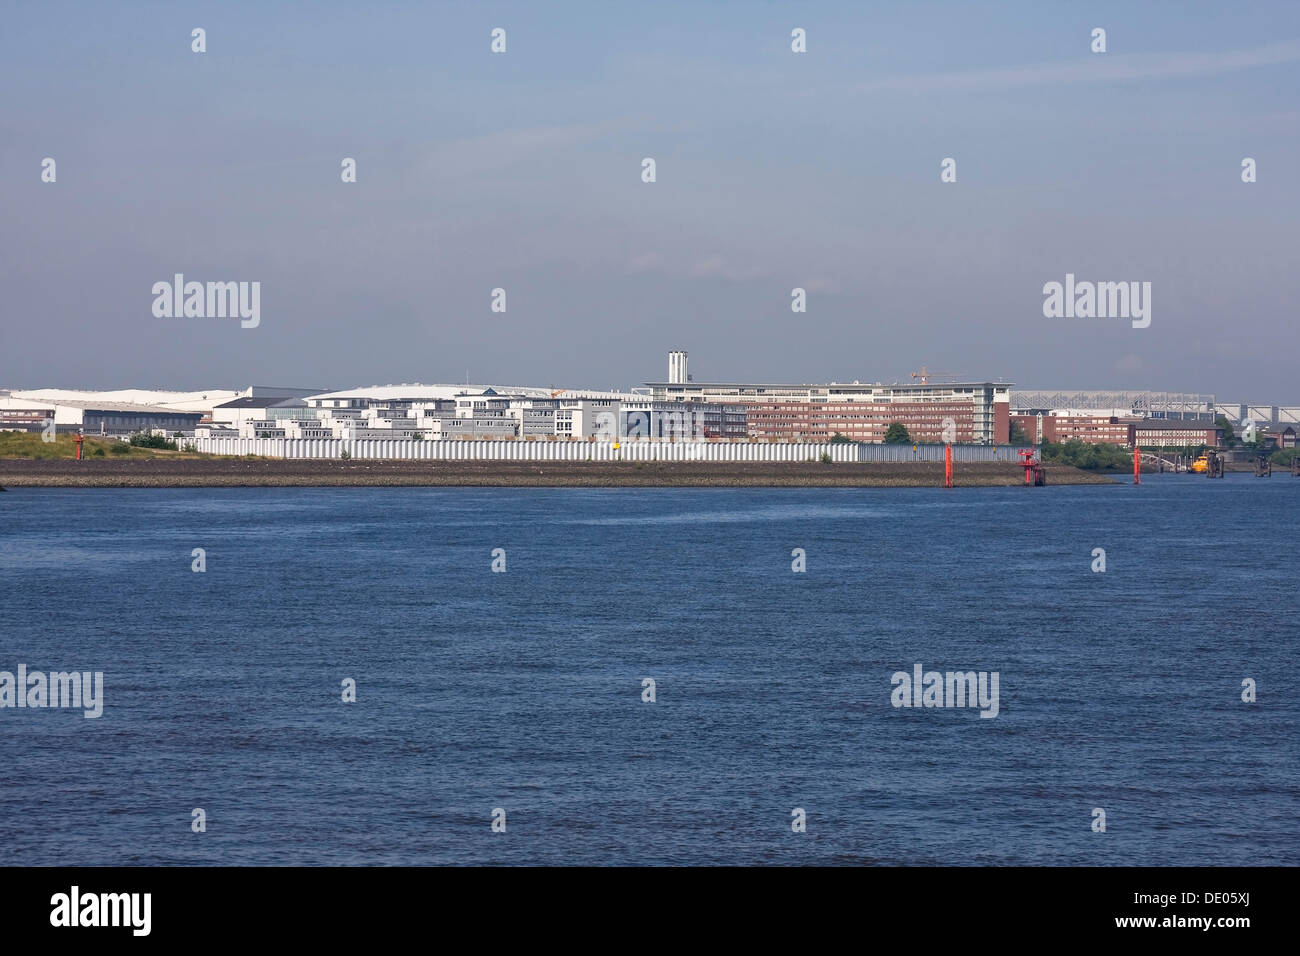 Factory premises Airbus aircraft manufacturer, Hamburg - Stock Image